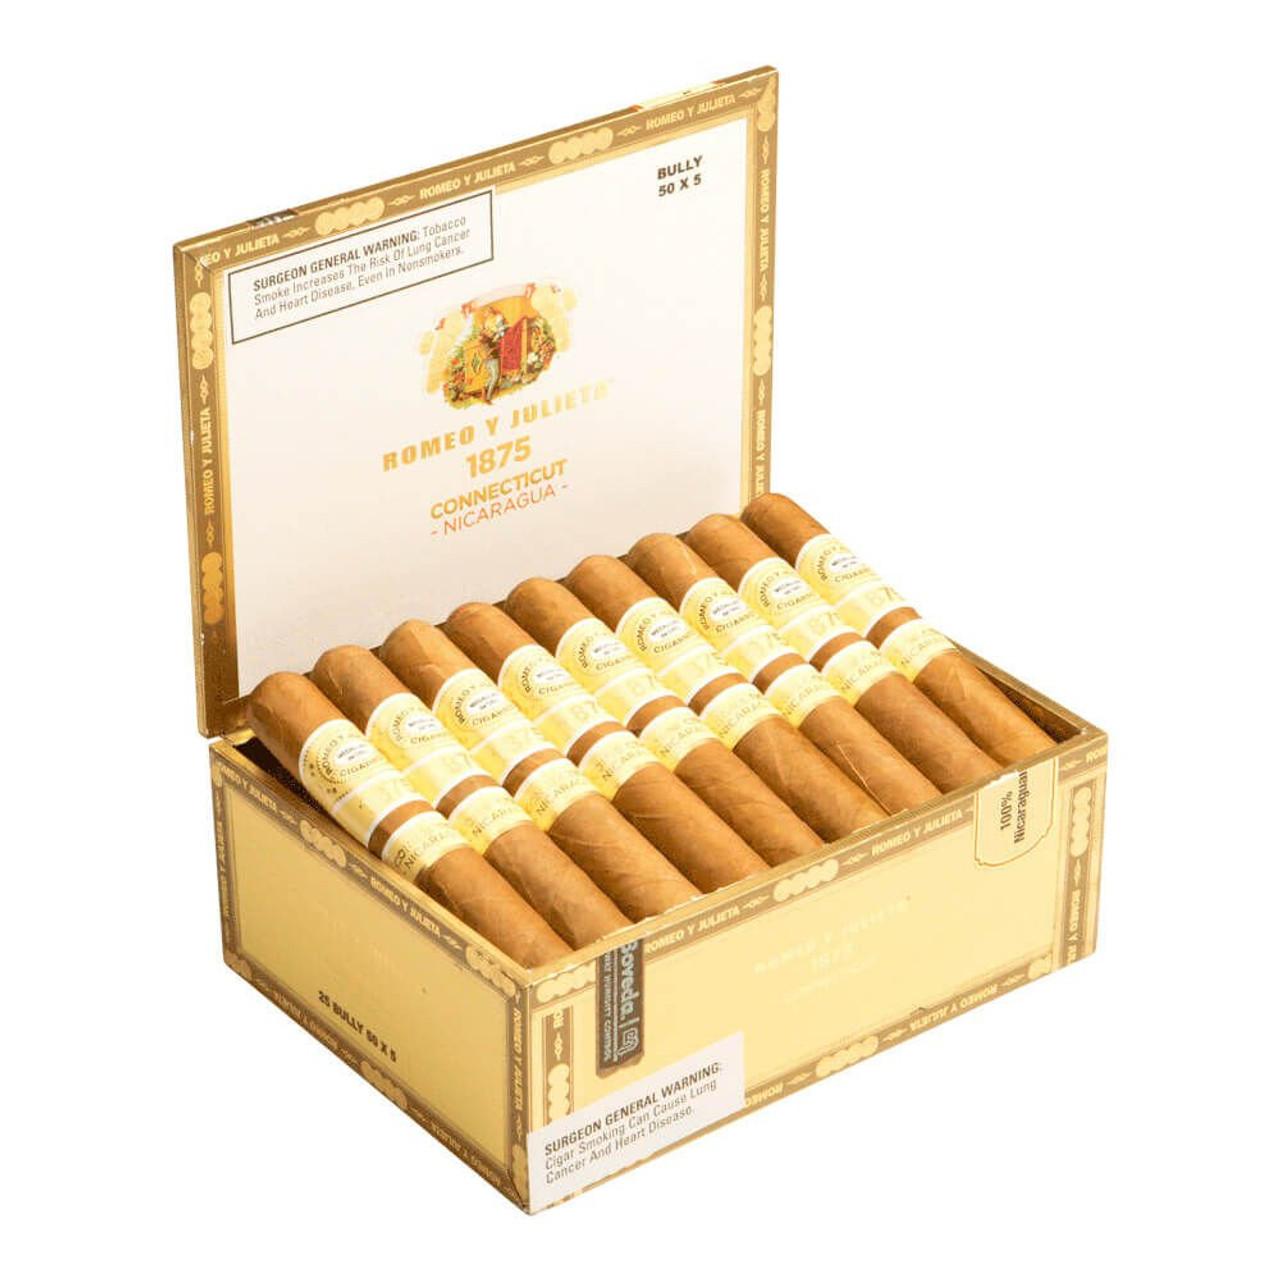 Romeo y Julieta 1875 Connecticut Nicaragua Toro Cigars - 6 x 52 (Box of 25)